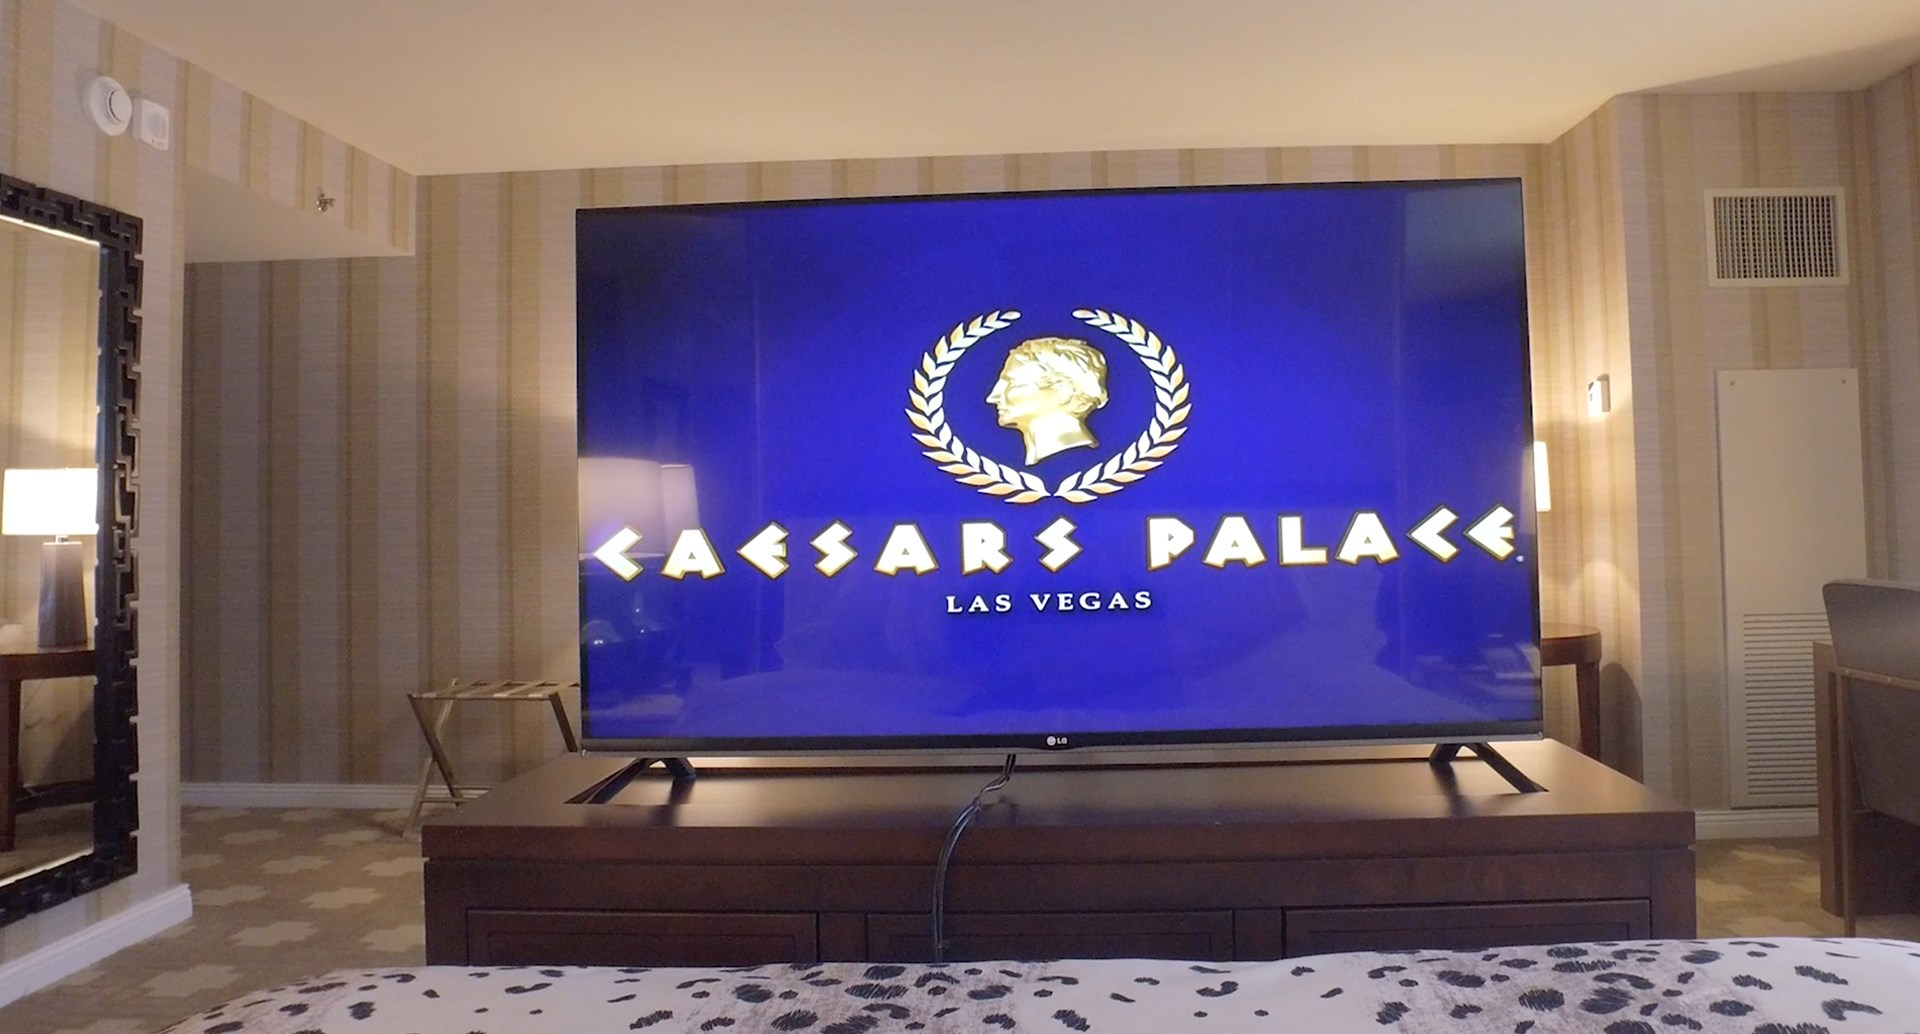 Ceaser's palace 12.jpg